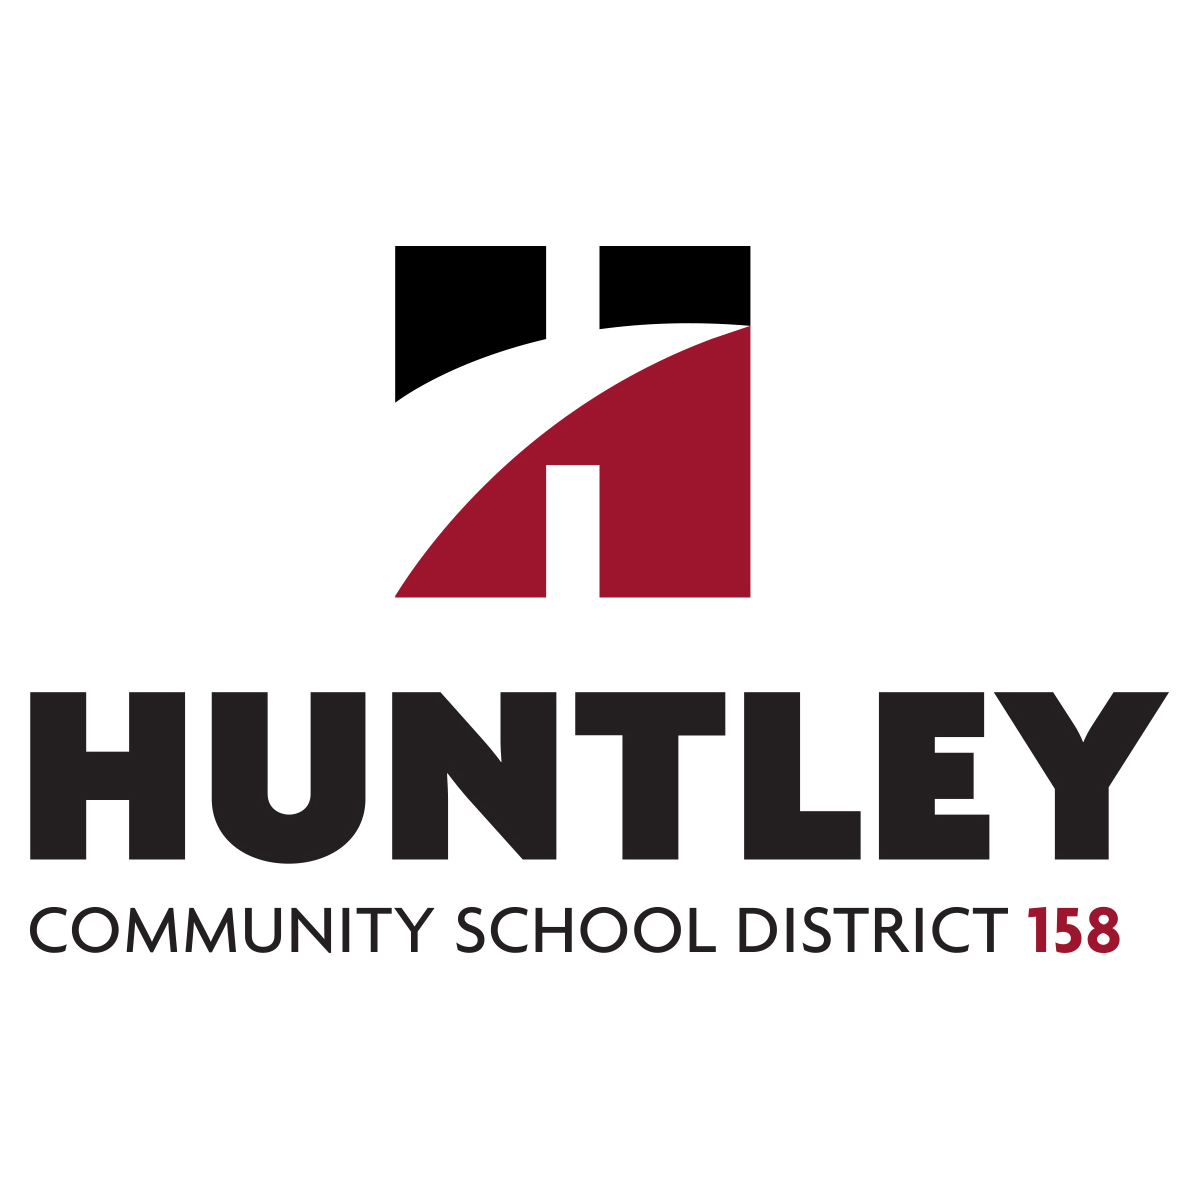 Huntley Community School District 158 Case Study